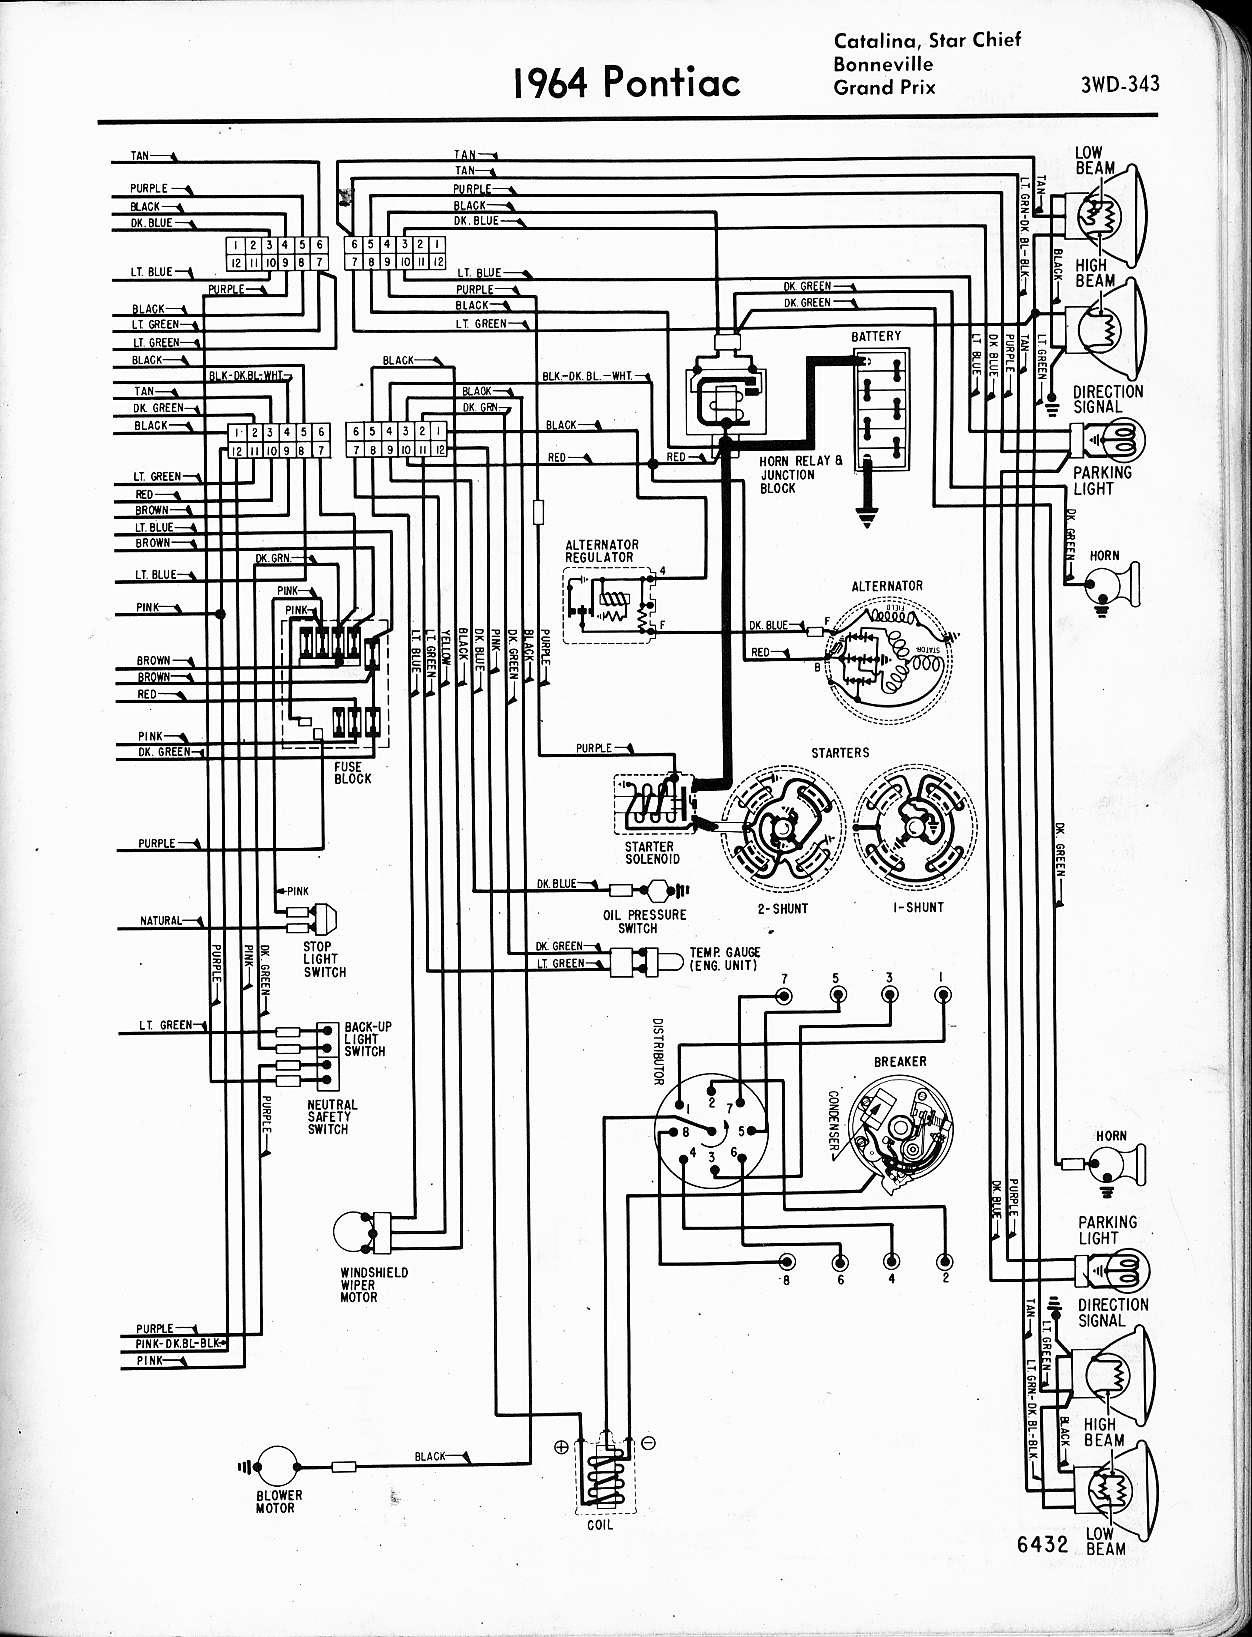 68 le mans fuse box diagram - wiring diagrams relax note-chart - note-chart .quado.it  note-chart.quado.it